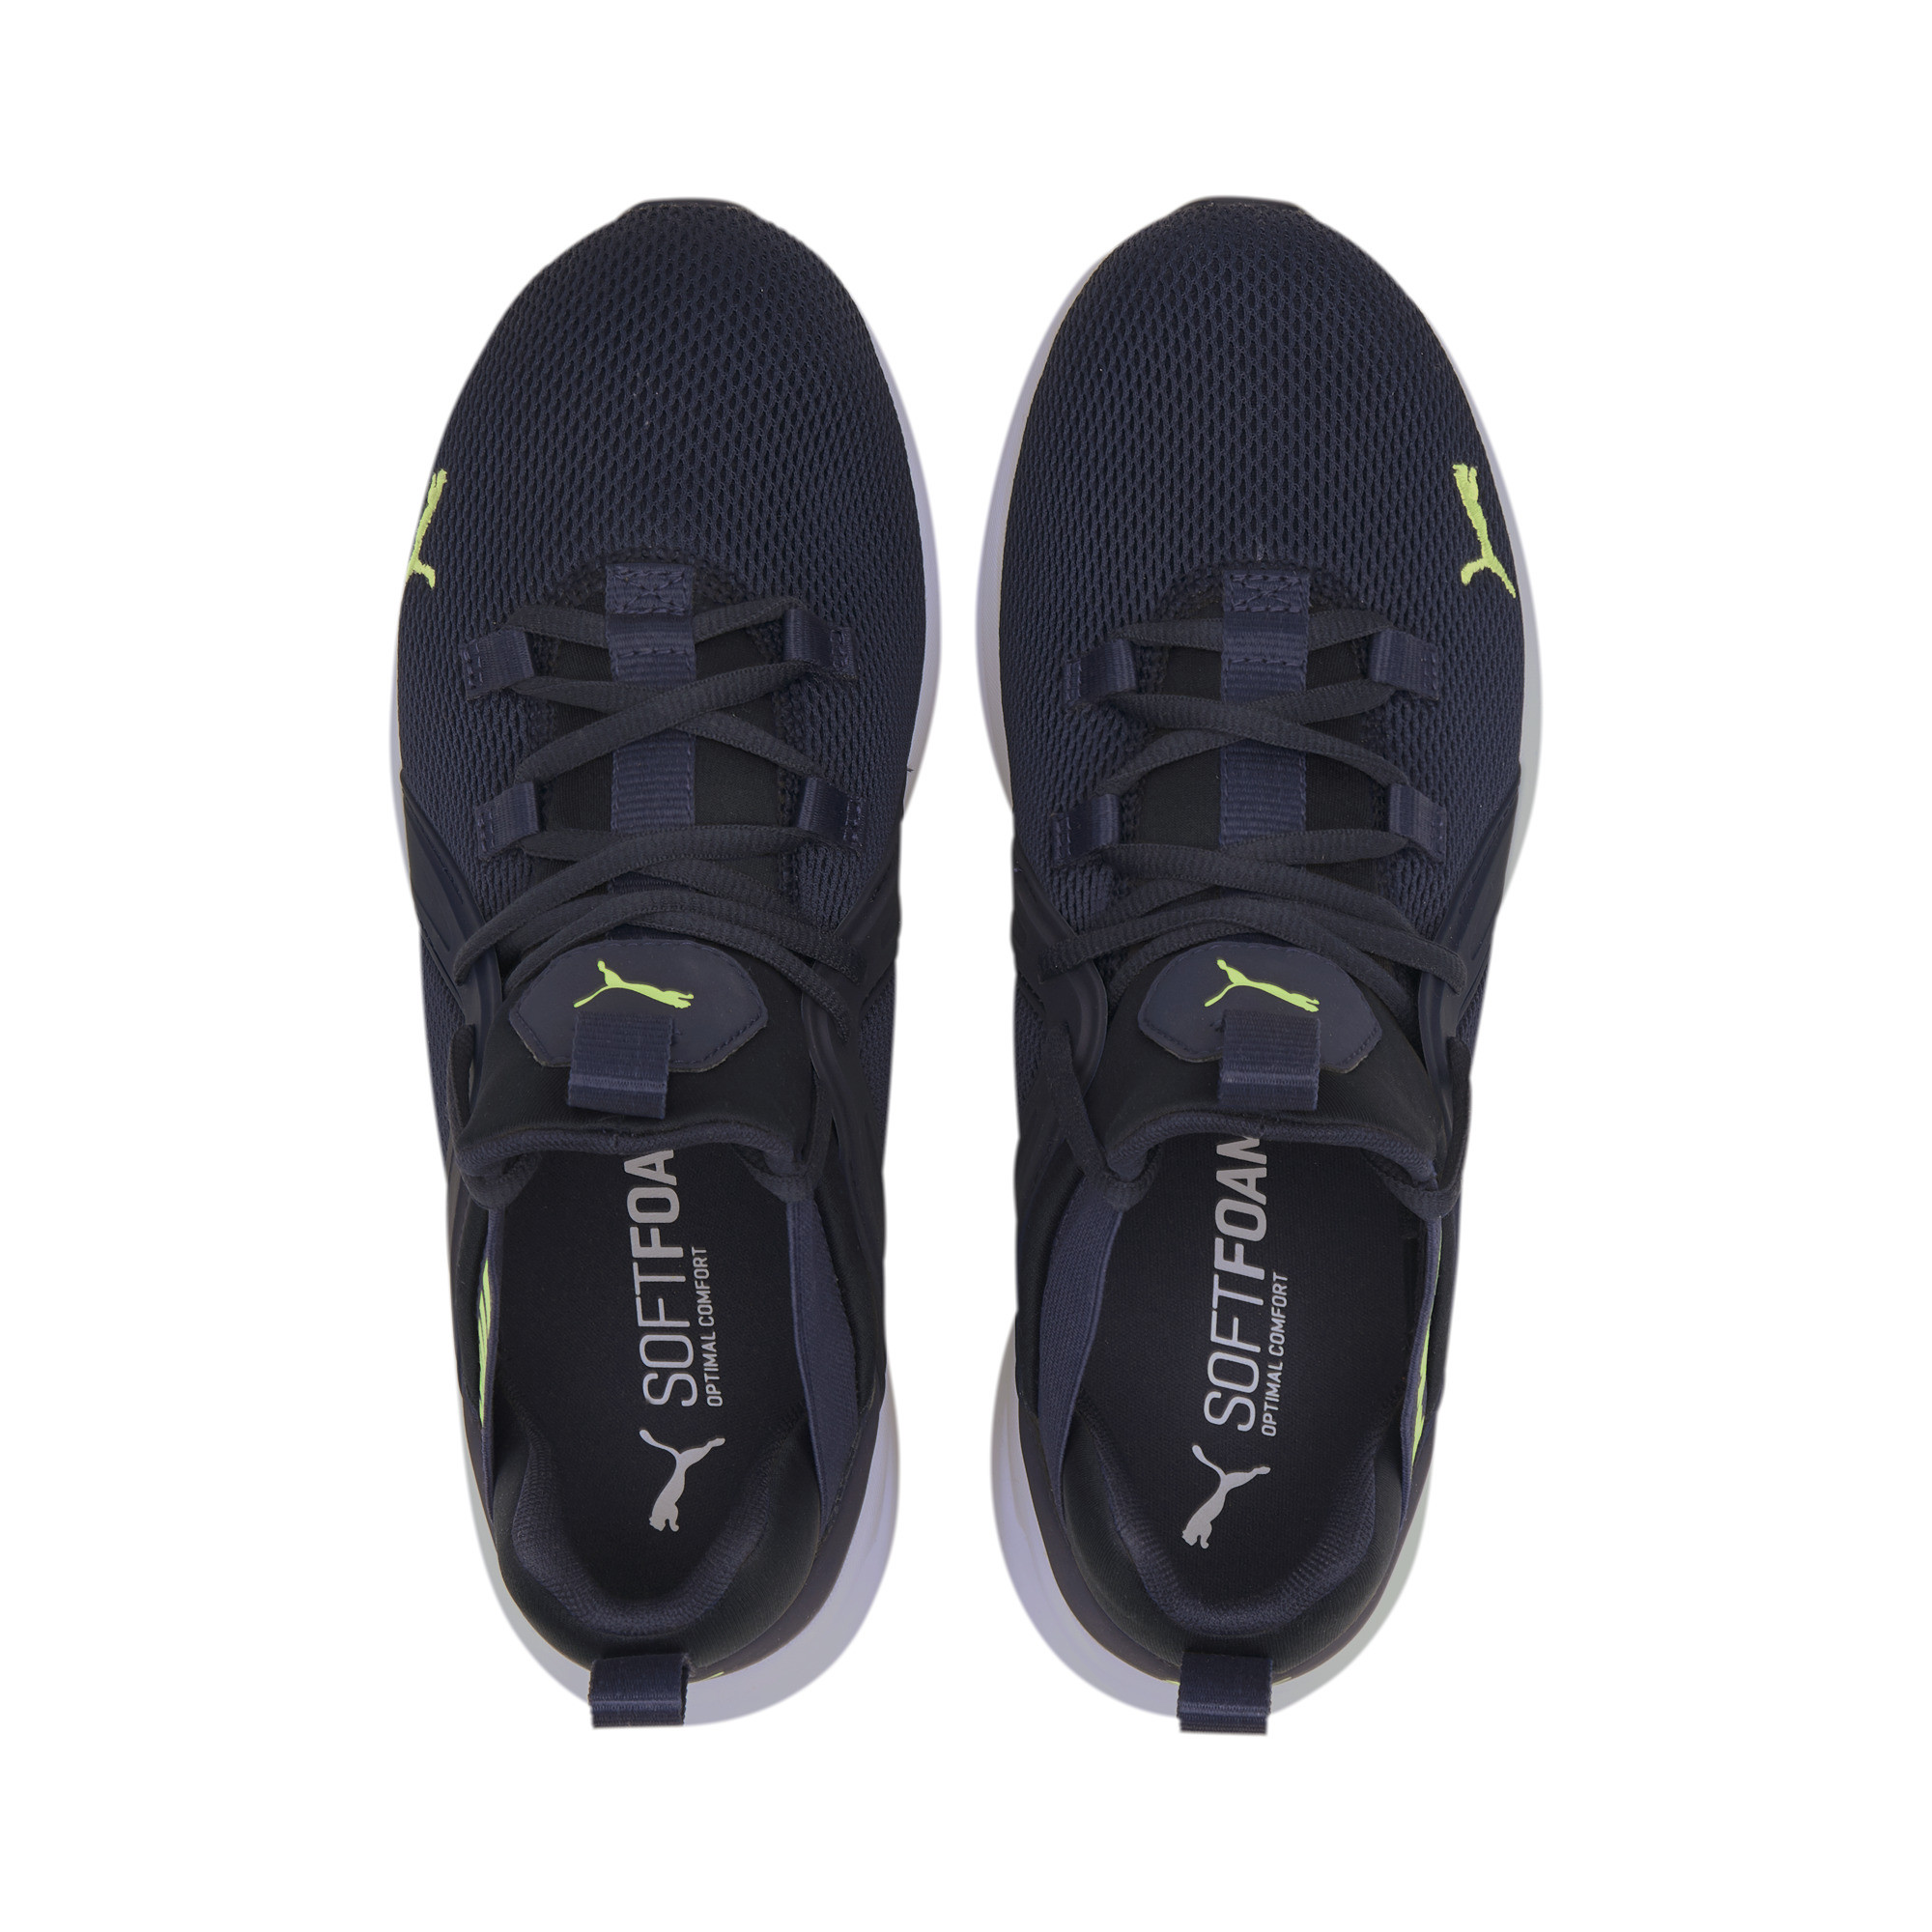 PUMA-Men-039-s-Enzo-2-Wide-Training-Shoes thumbnail 15